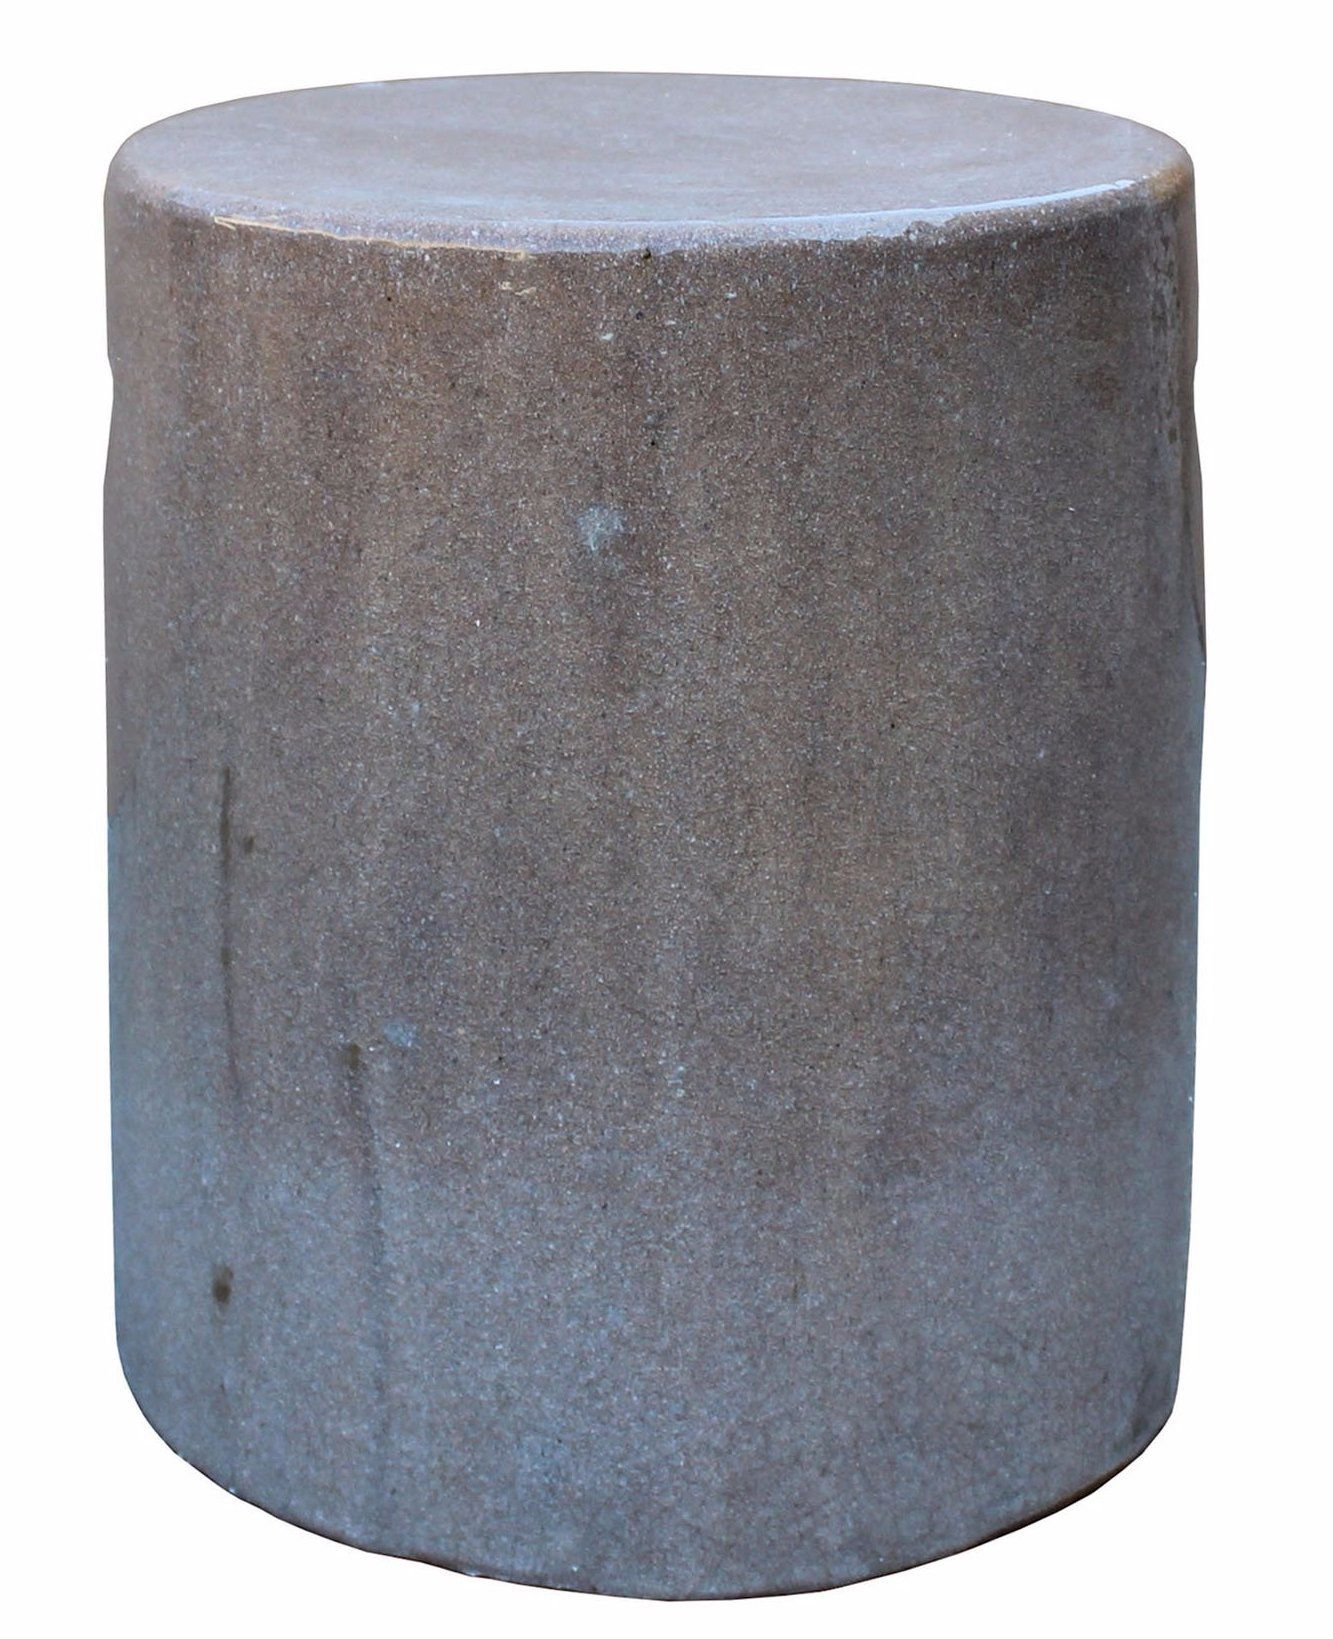 Sensational Chinese Ceramic Clay Mauve Beige Glaze Round Flat Column Beatyapartments Chair Design Images Beatyapartmentscom